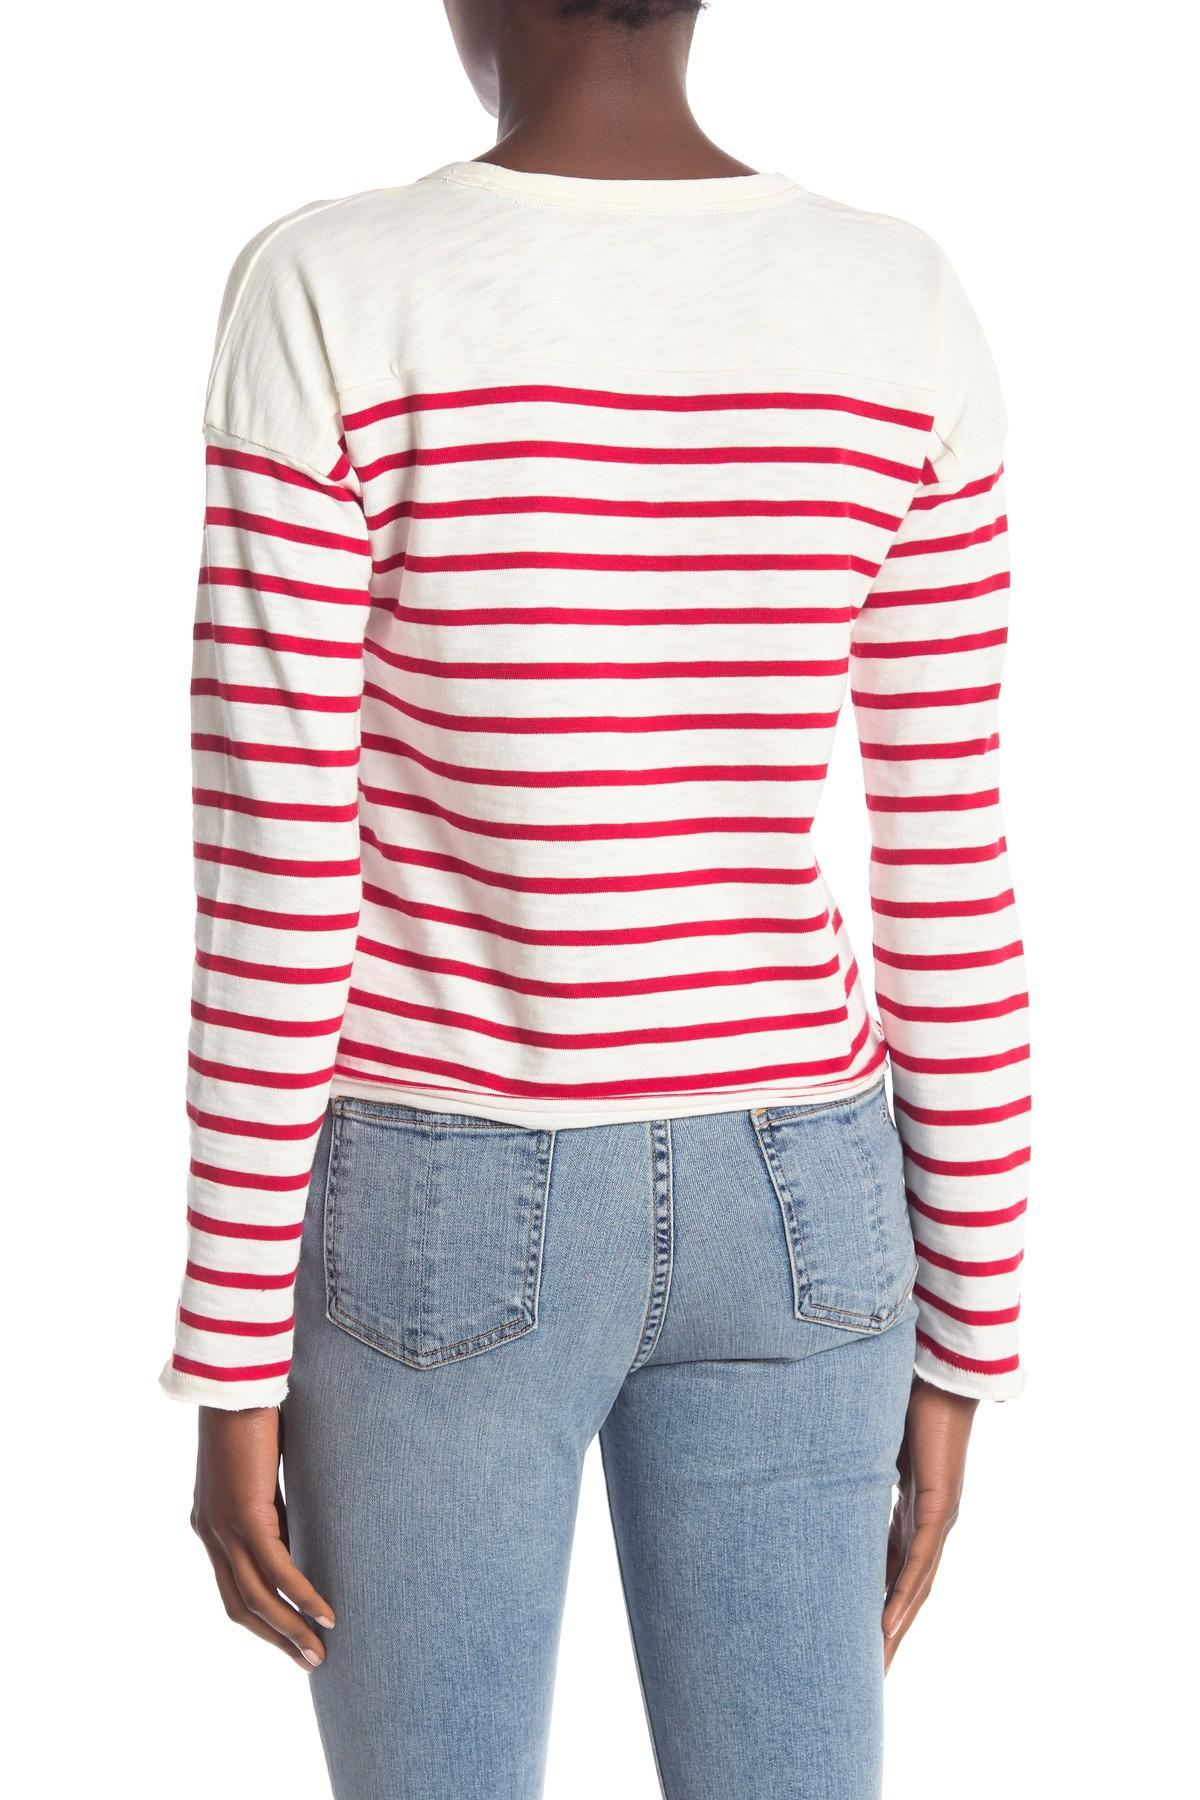 43f966e078 Rag & Bone Halsey Striped Long Sleeve Shirt - Lyst